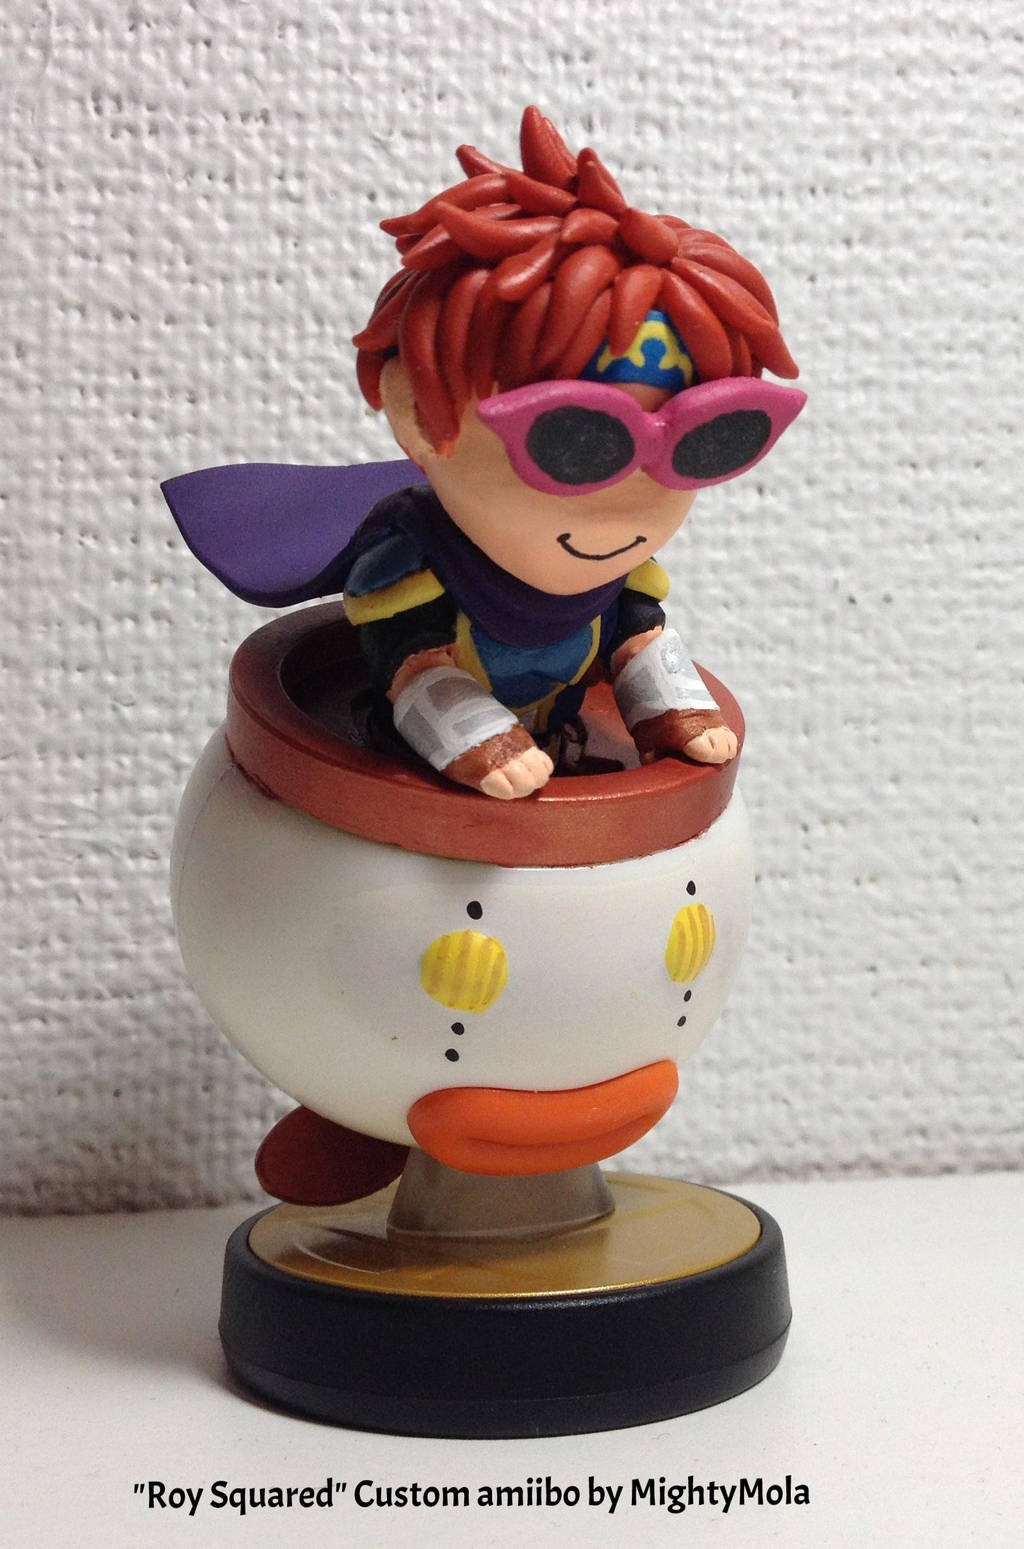 Roy Squared (Custom amiibo) by mightymola